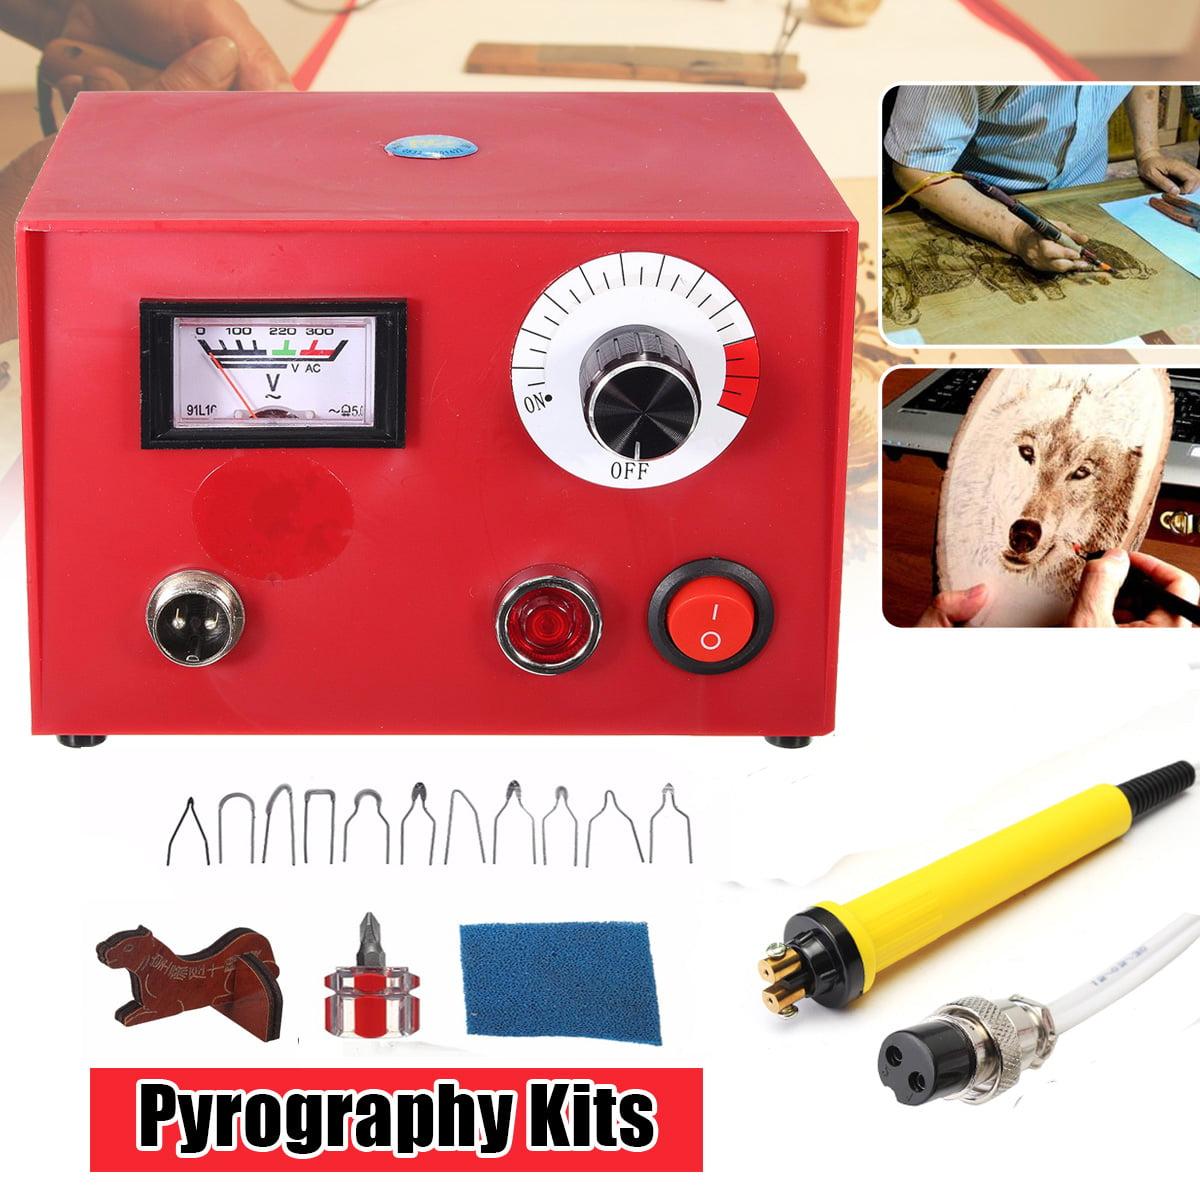 220V 50W Multifunction Pyrography Machine Gourd Wood Burning Tool Pyrography Crafts Tool Kit New